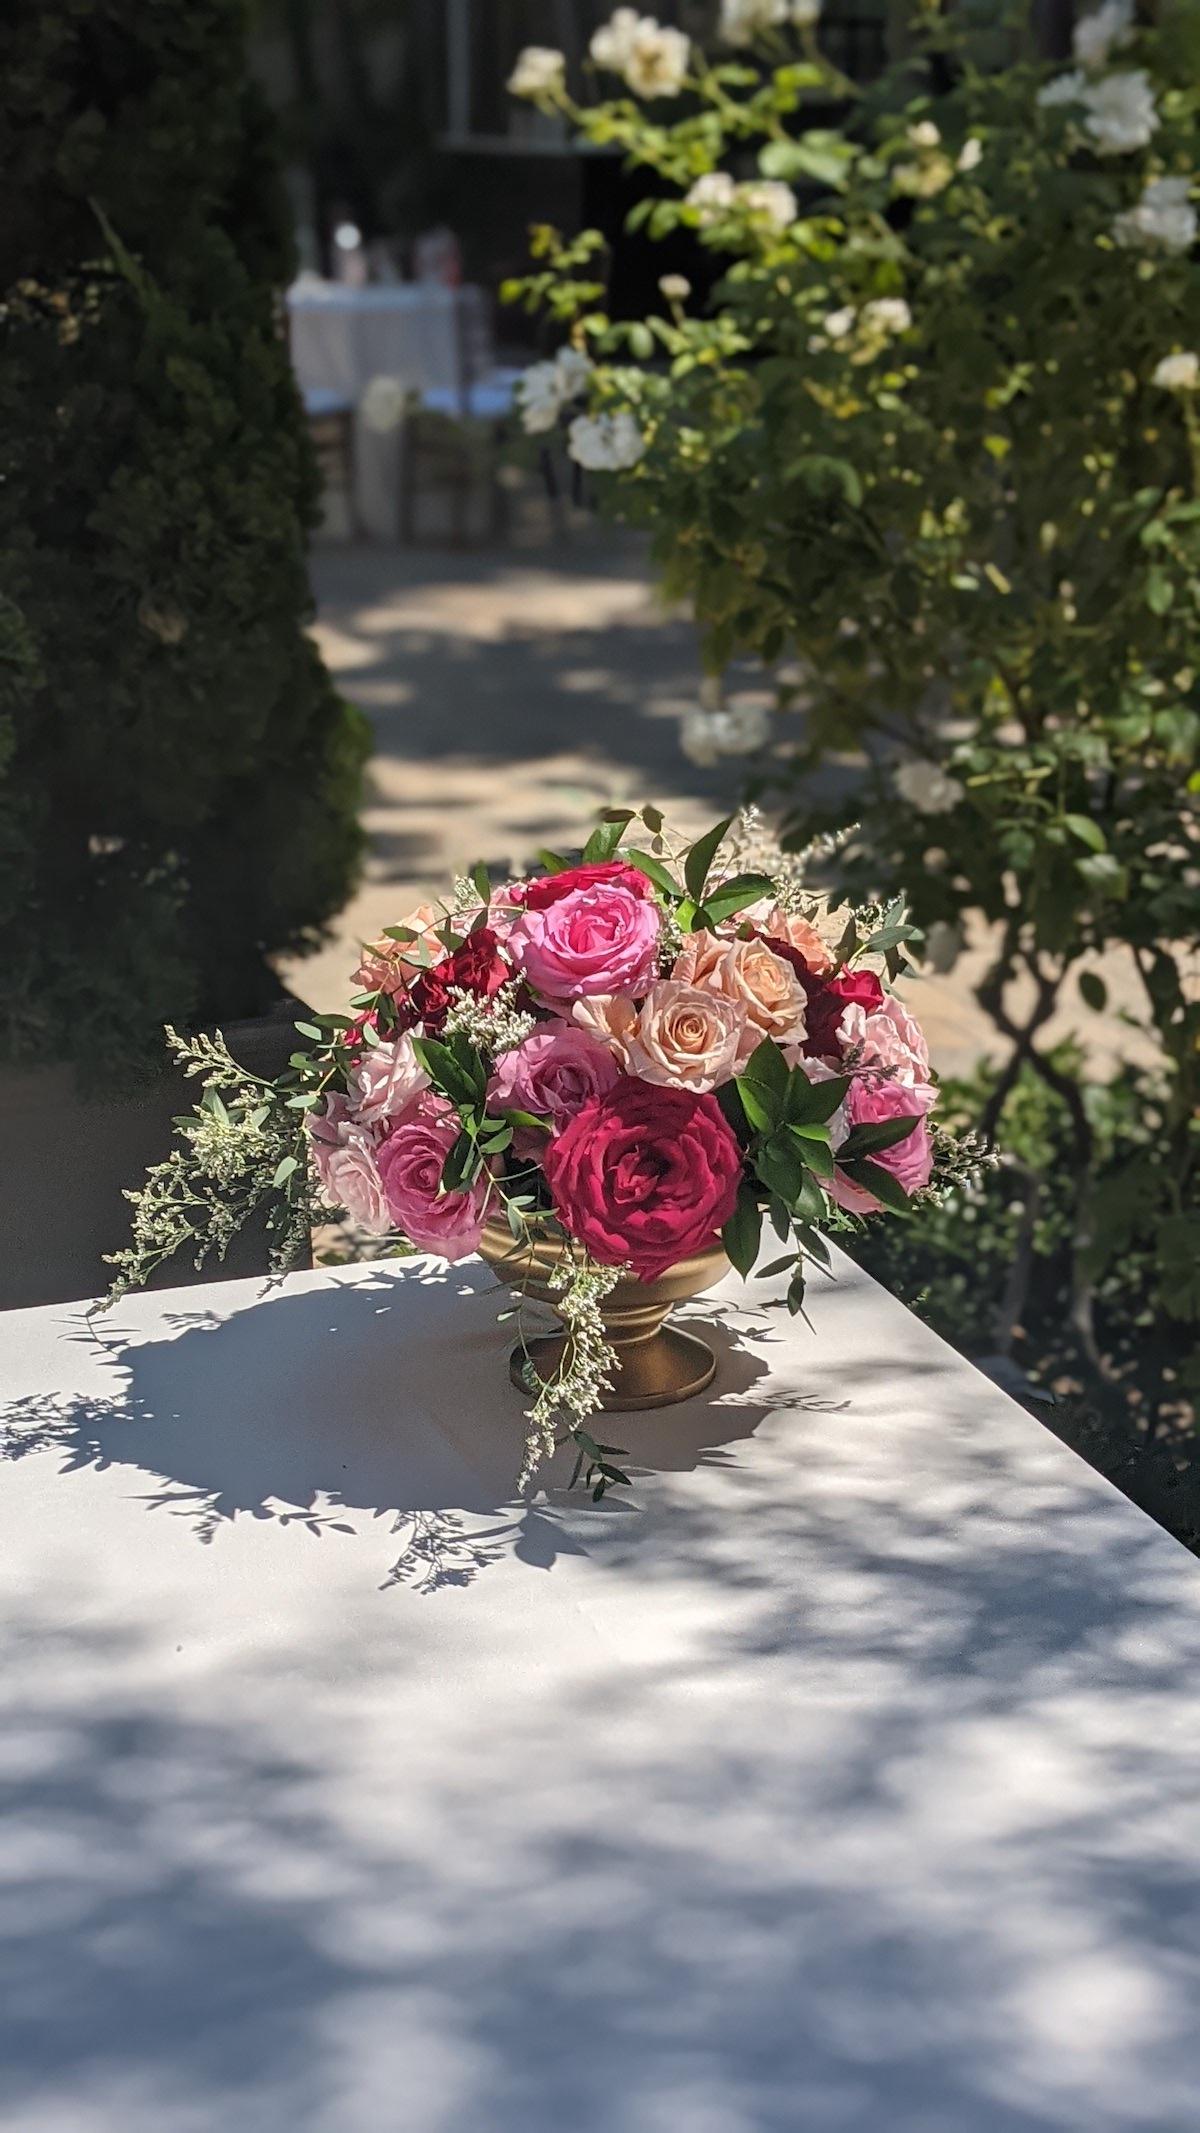 Greeting flowers